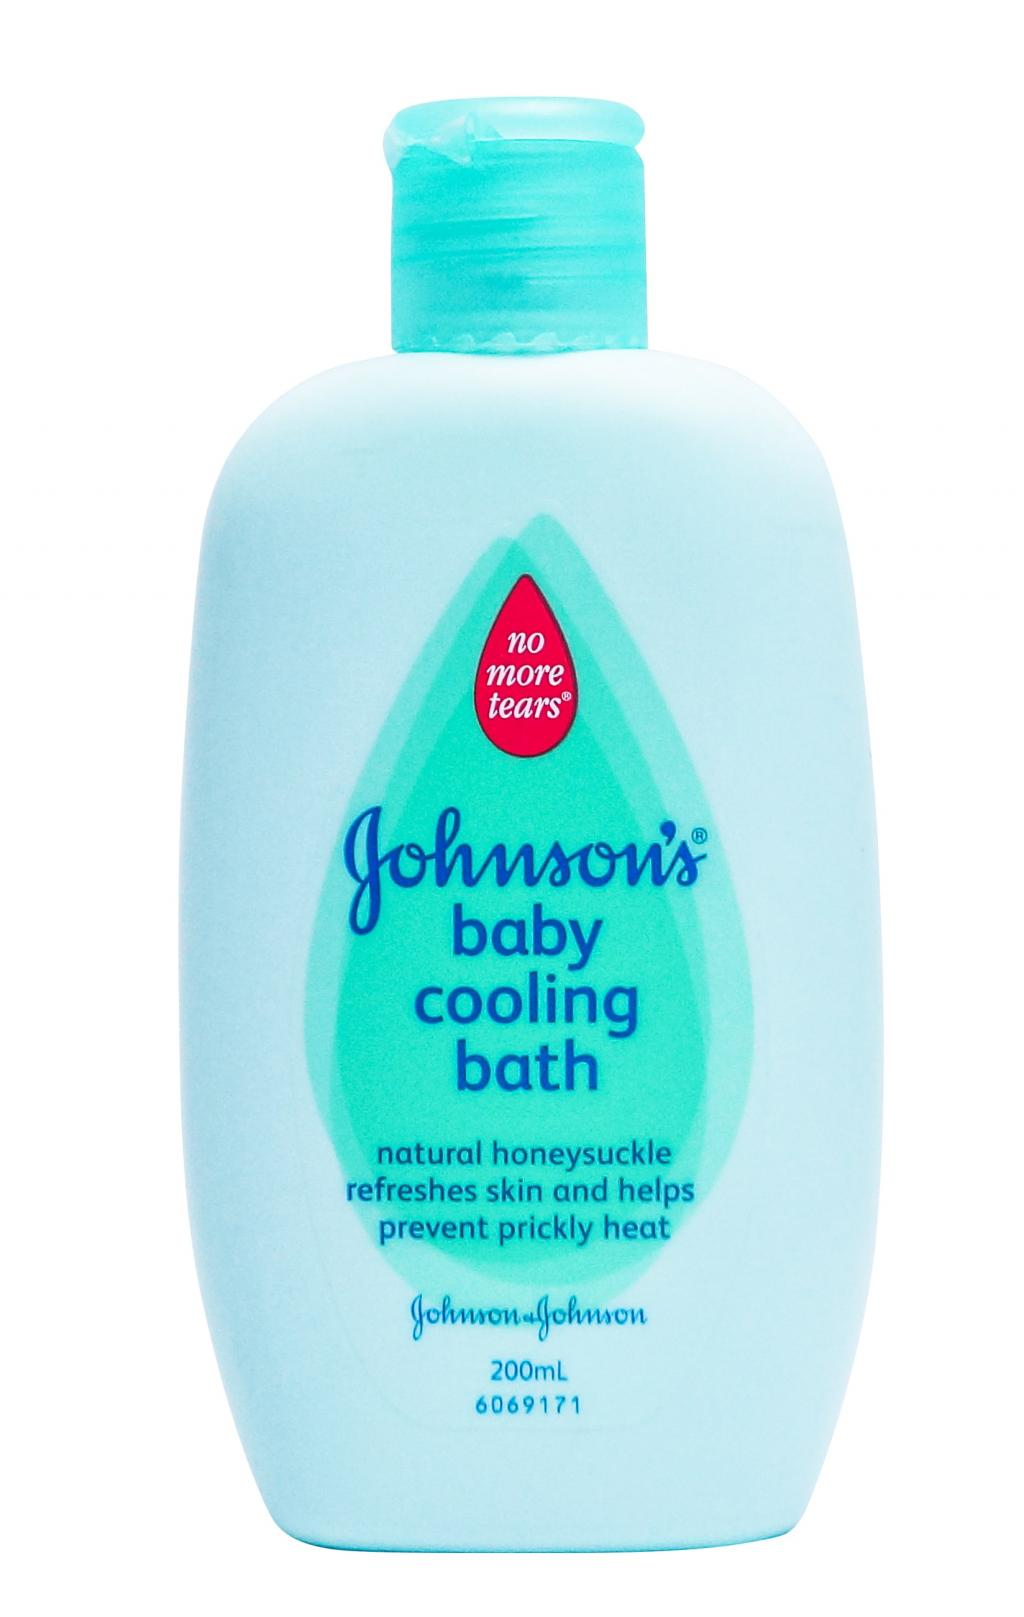 JOHNSON'S® baby cooling bath